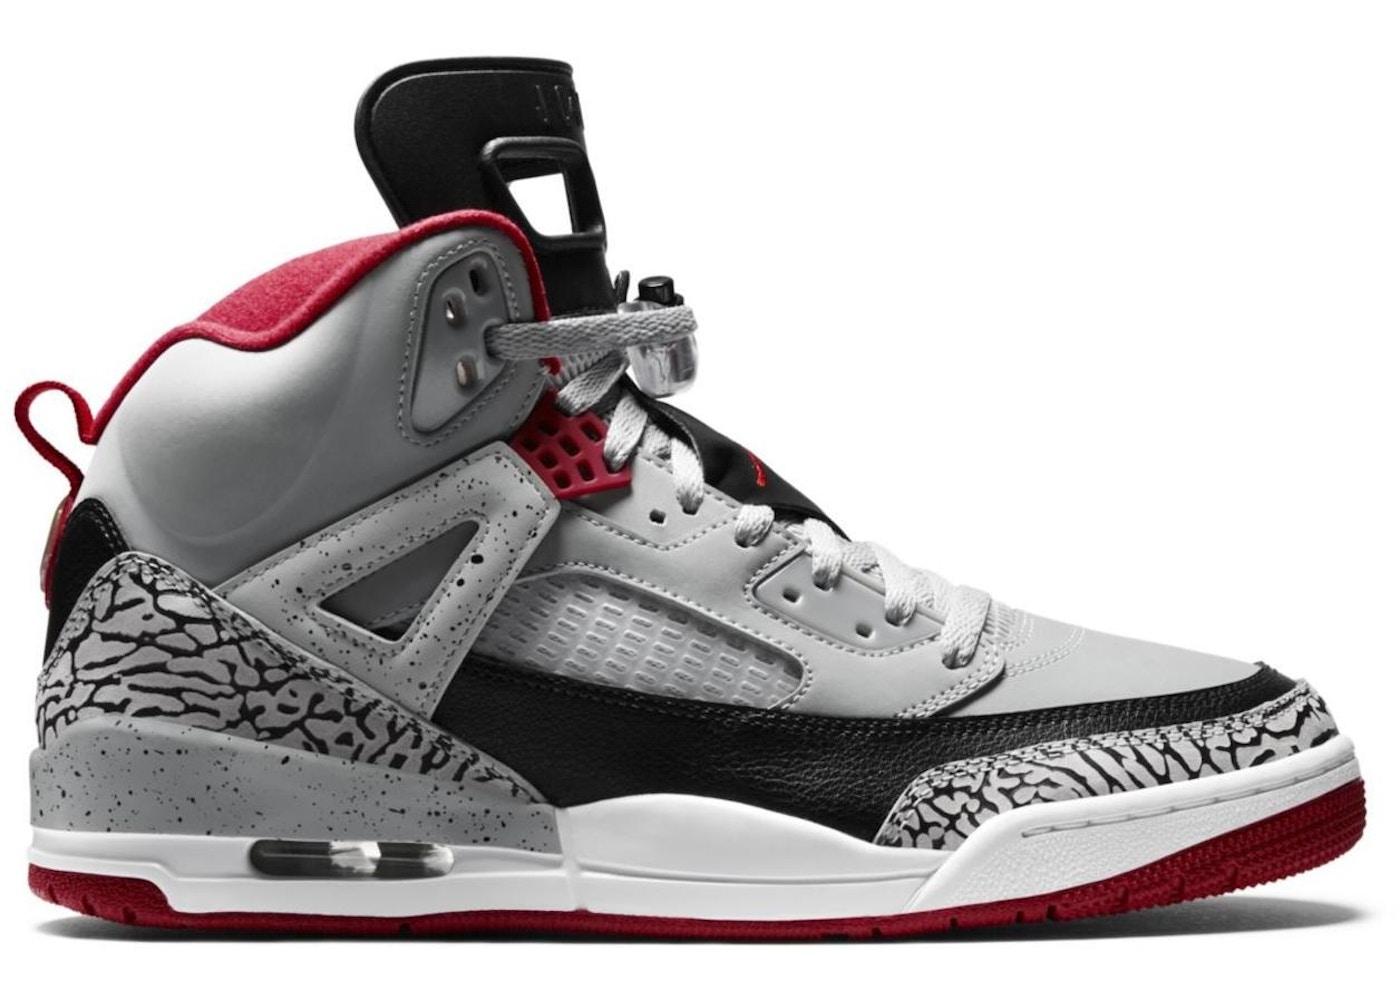 reputable site 7a60a 5520c Jordan Spiz ike Wolf Grey